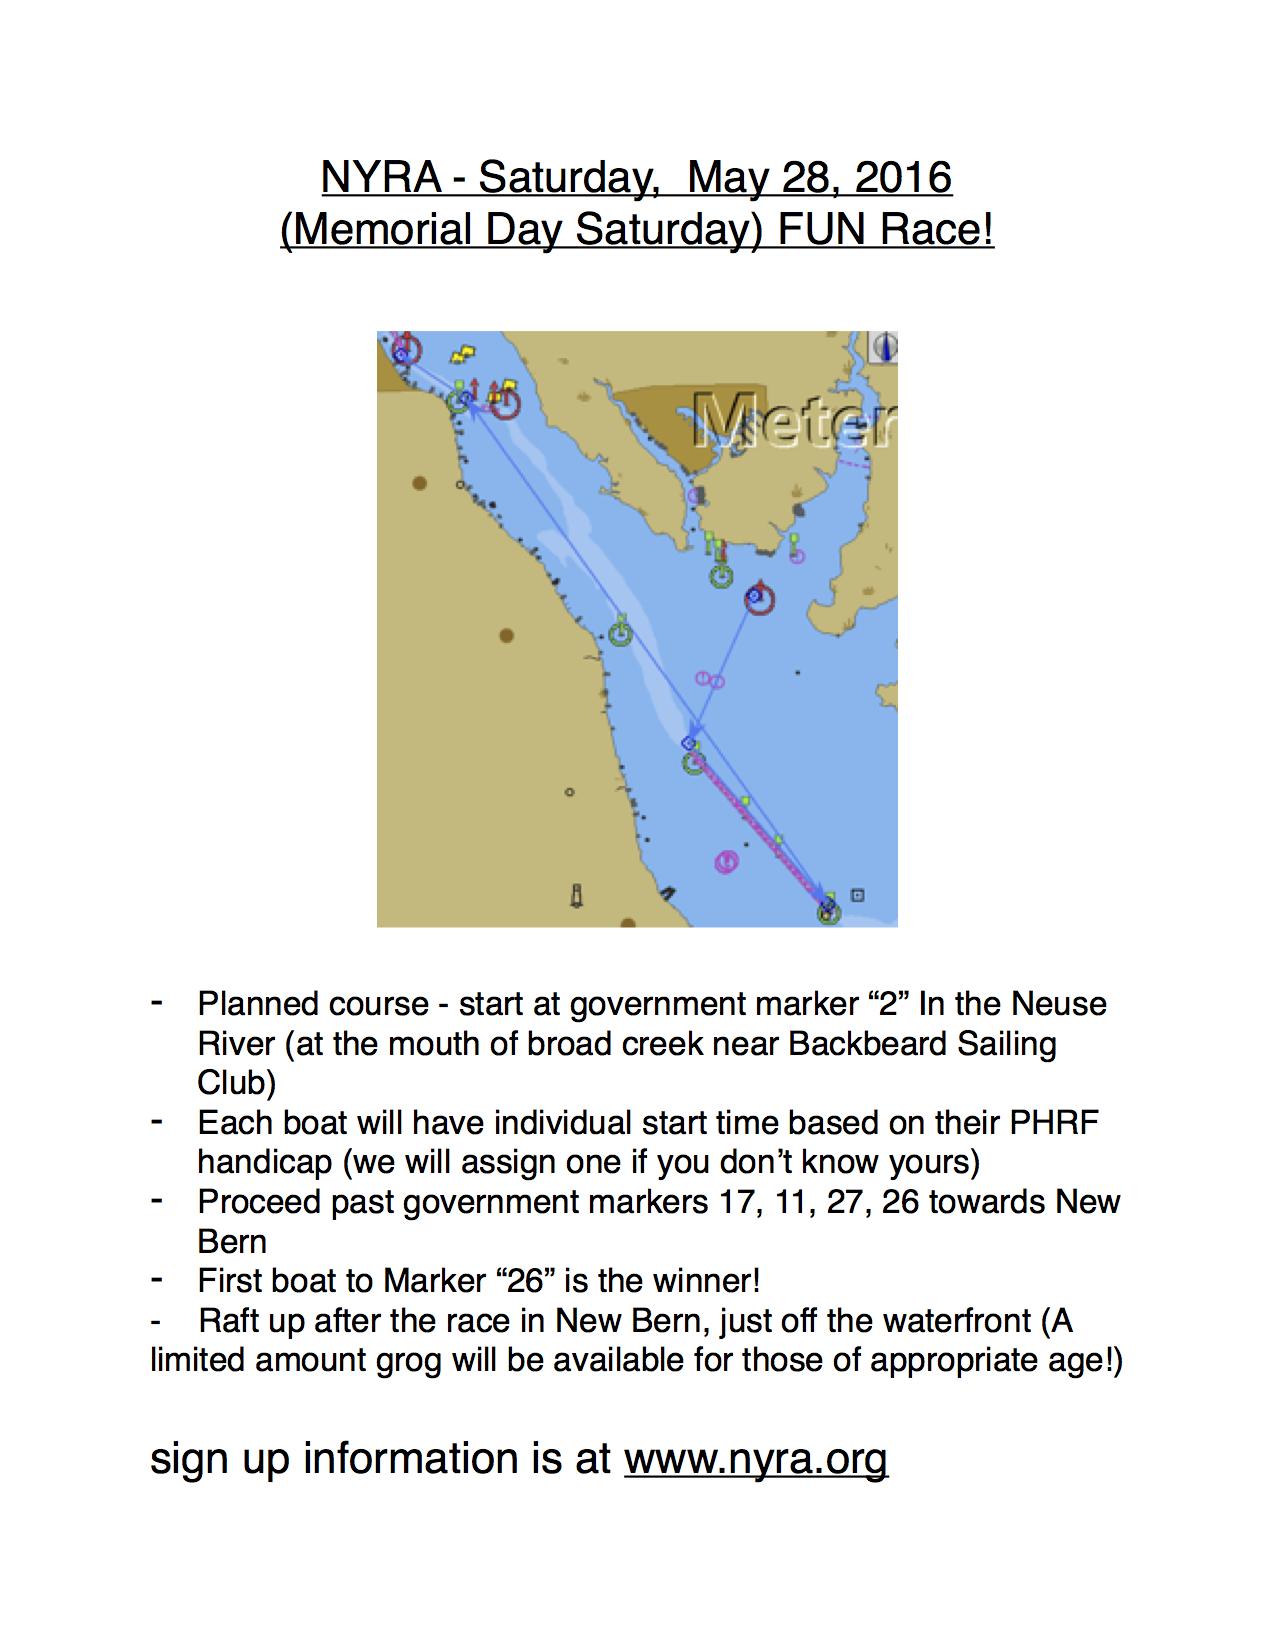 2016 NYRA Memorial Day fun race